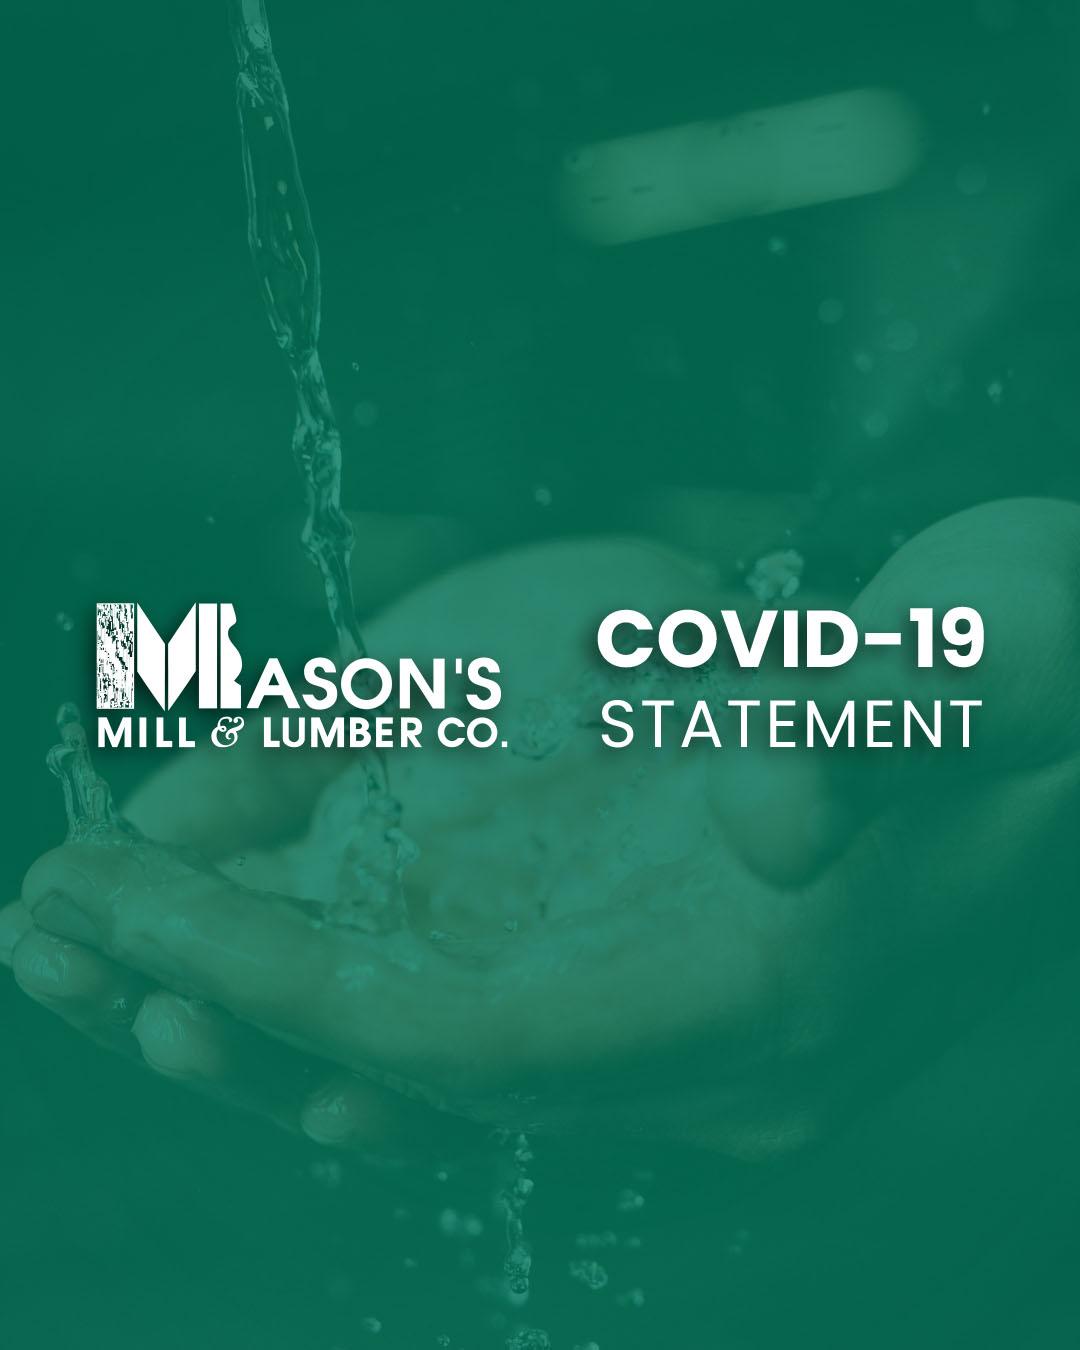 Mason's Mill & Lumber Co. COVID-19 Statement